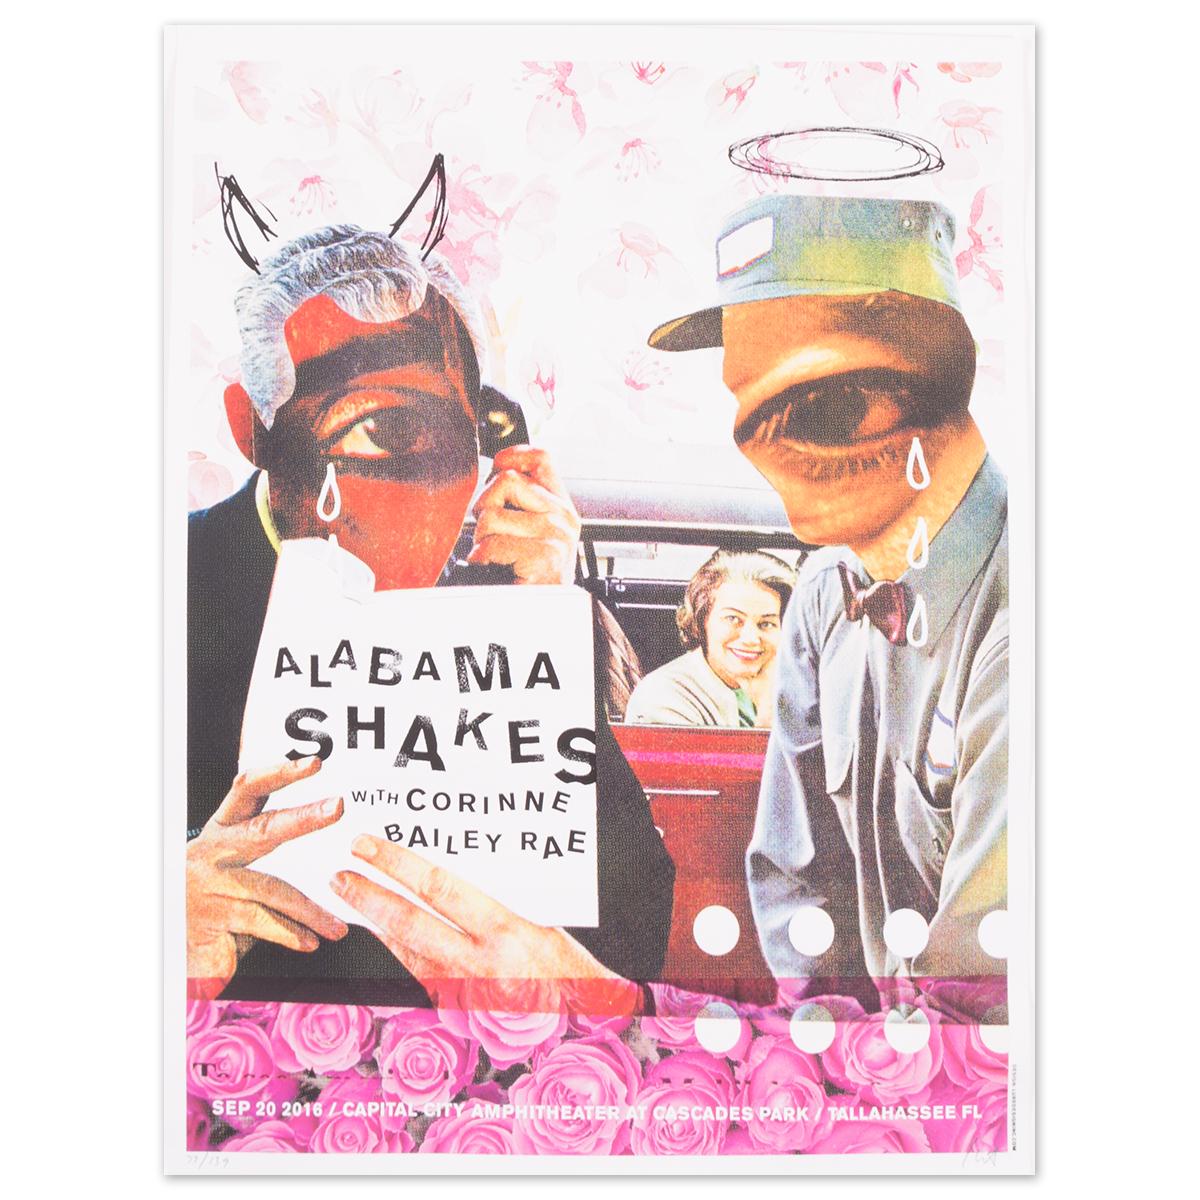 Alabama Shakes Show Poster - Sep. 20, 2016 Capital City Amphitheater, Cascades Park